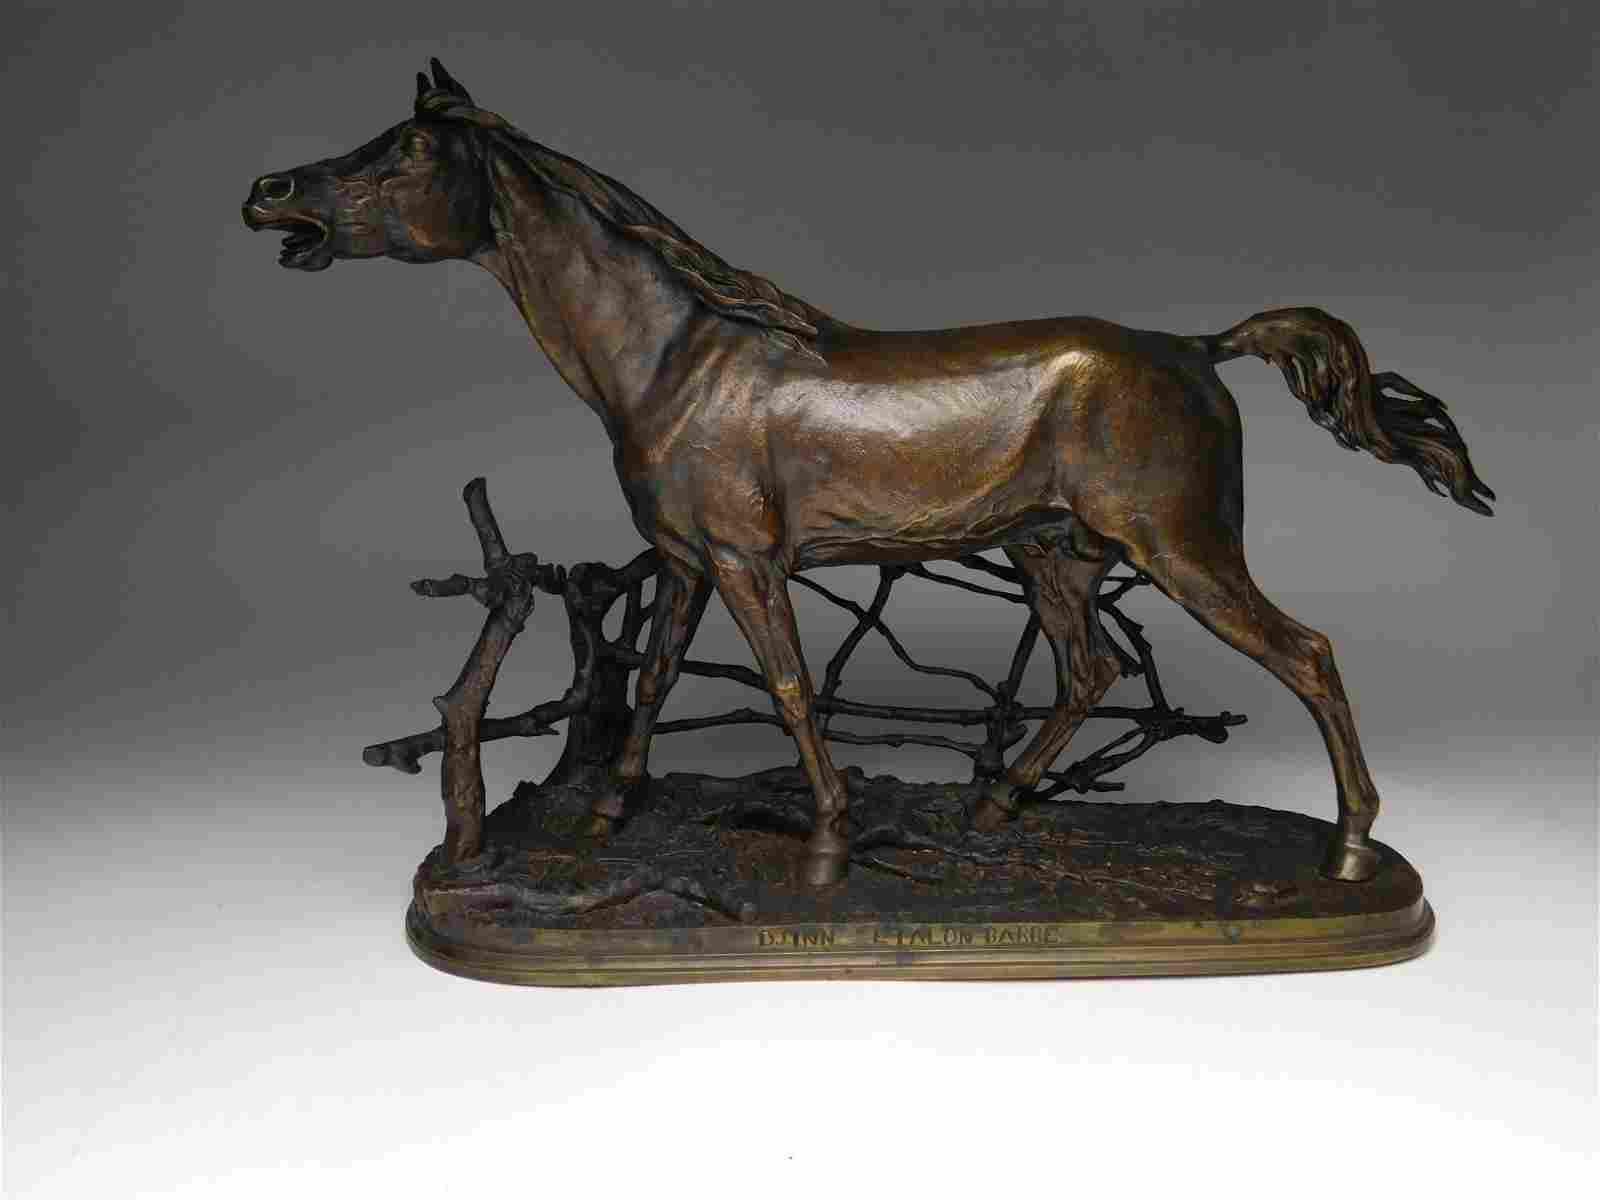 Pierre Jules Mene bronze sculpture